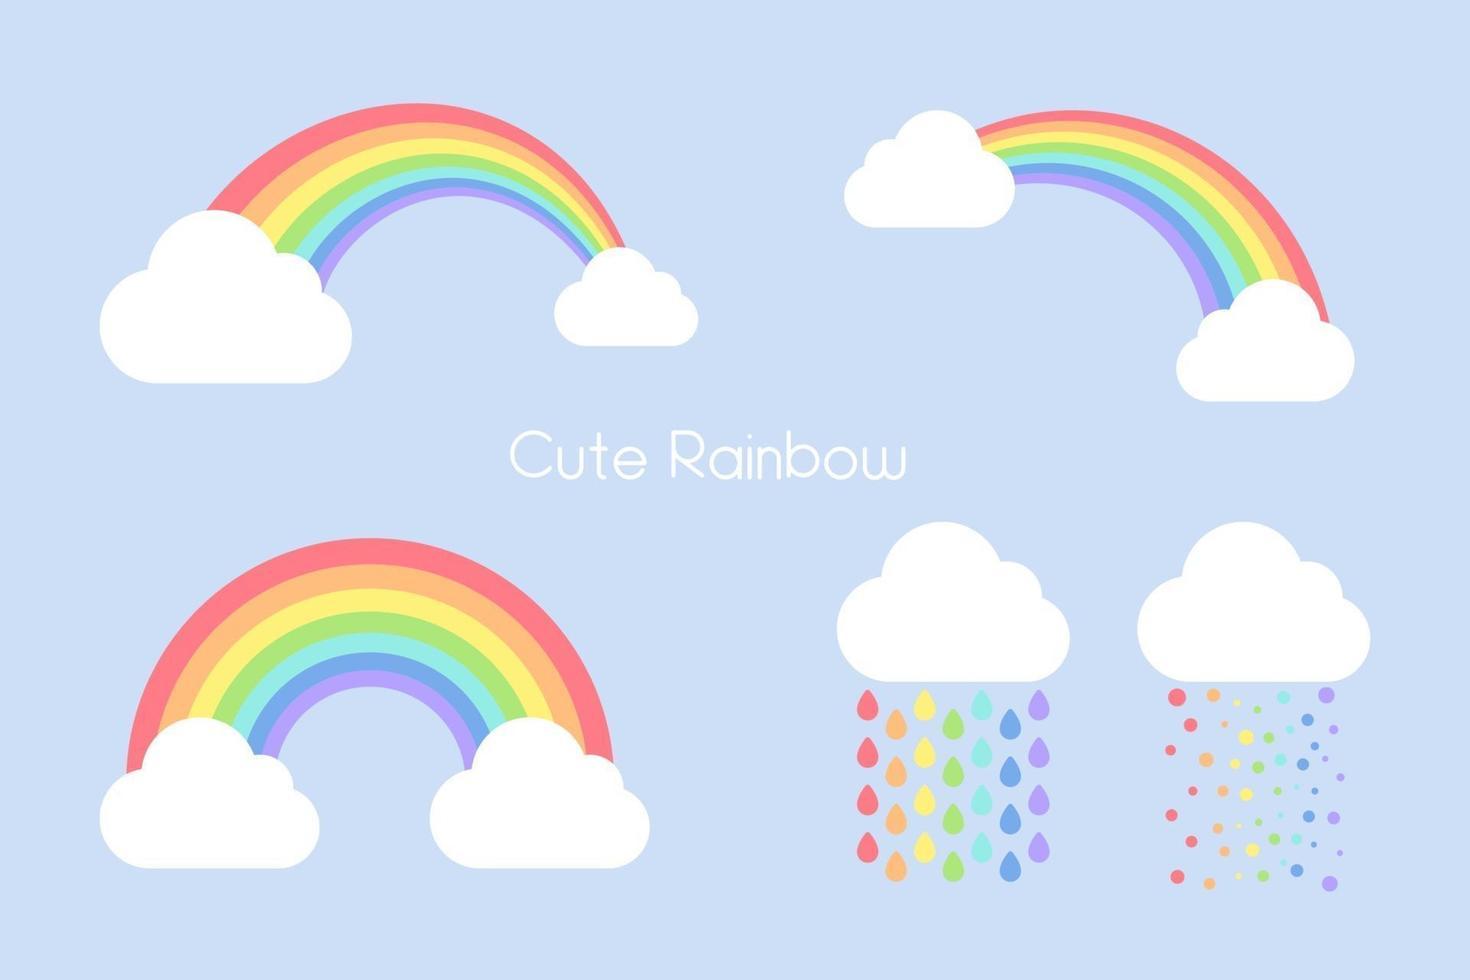 conjunto de arco-íris fofo vetor